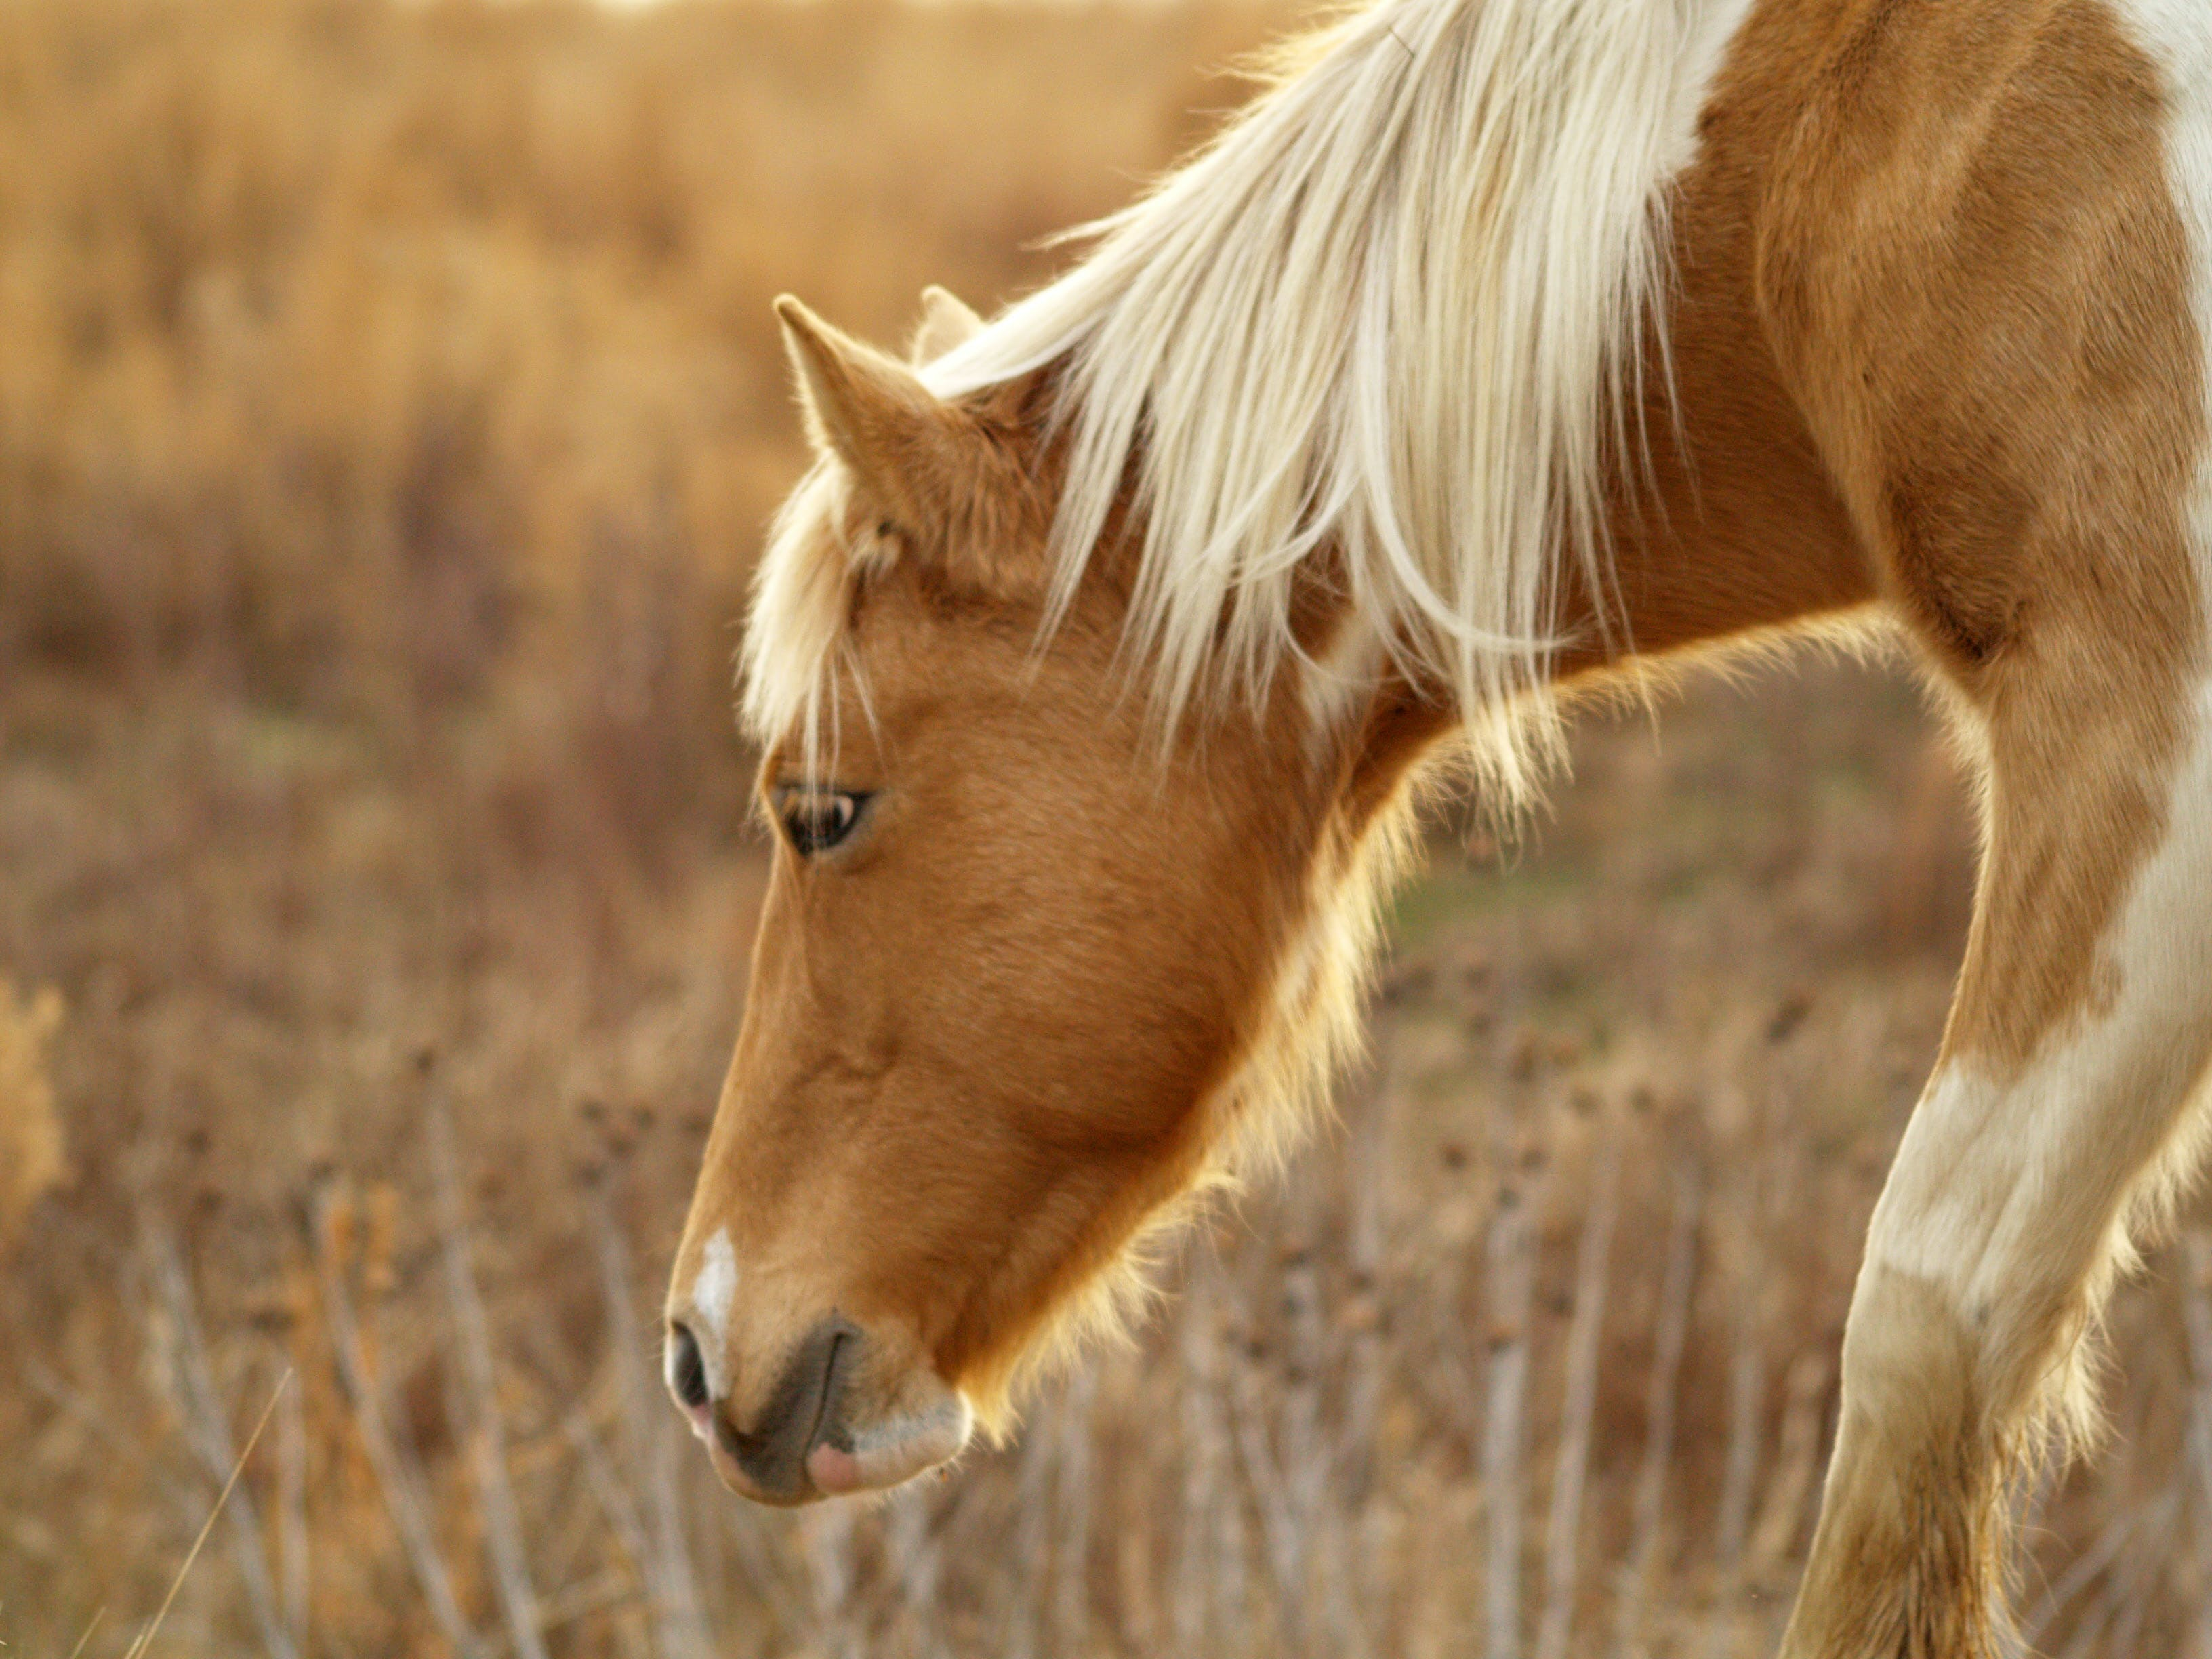 animal photography, animals, grazing